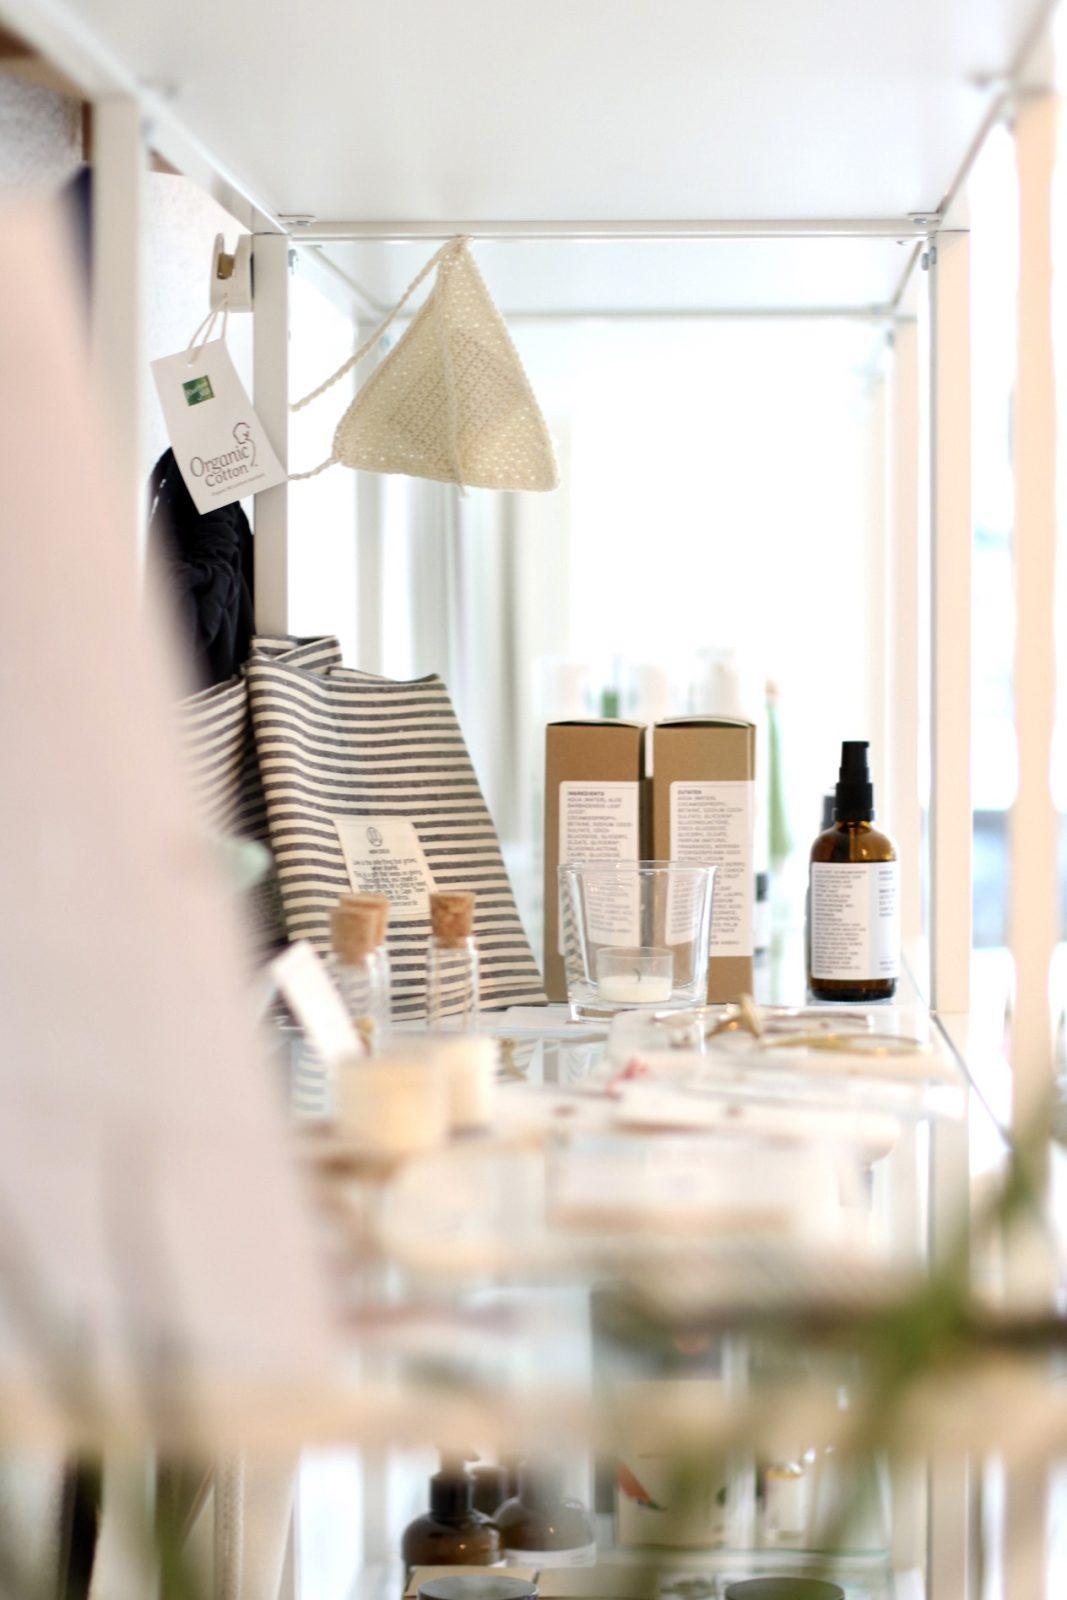 Organic Beauty Store & Spa in Saarbrücken